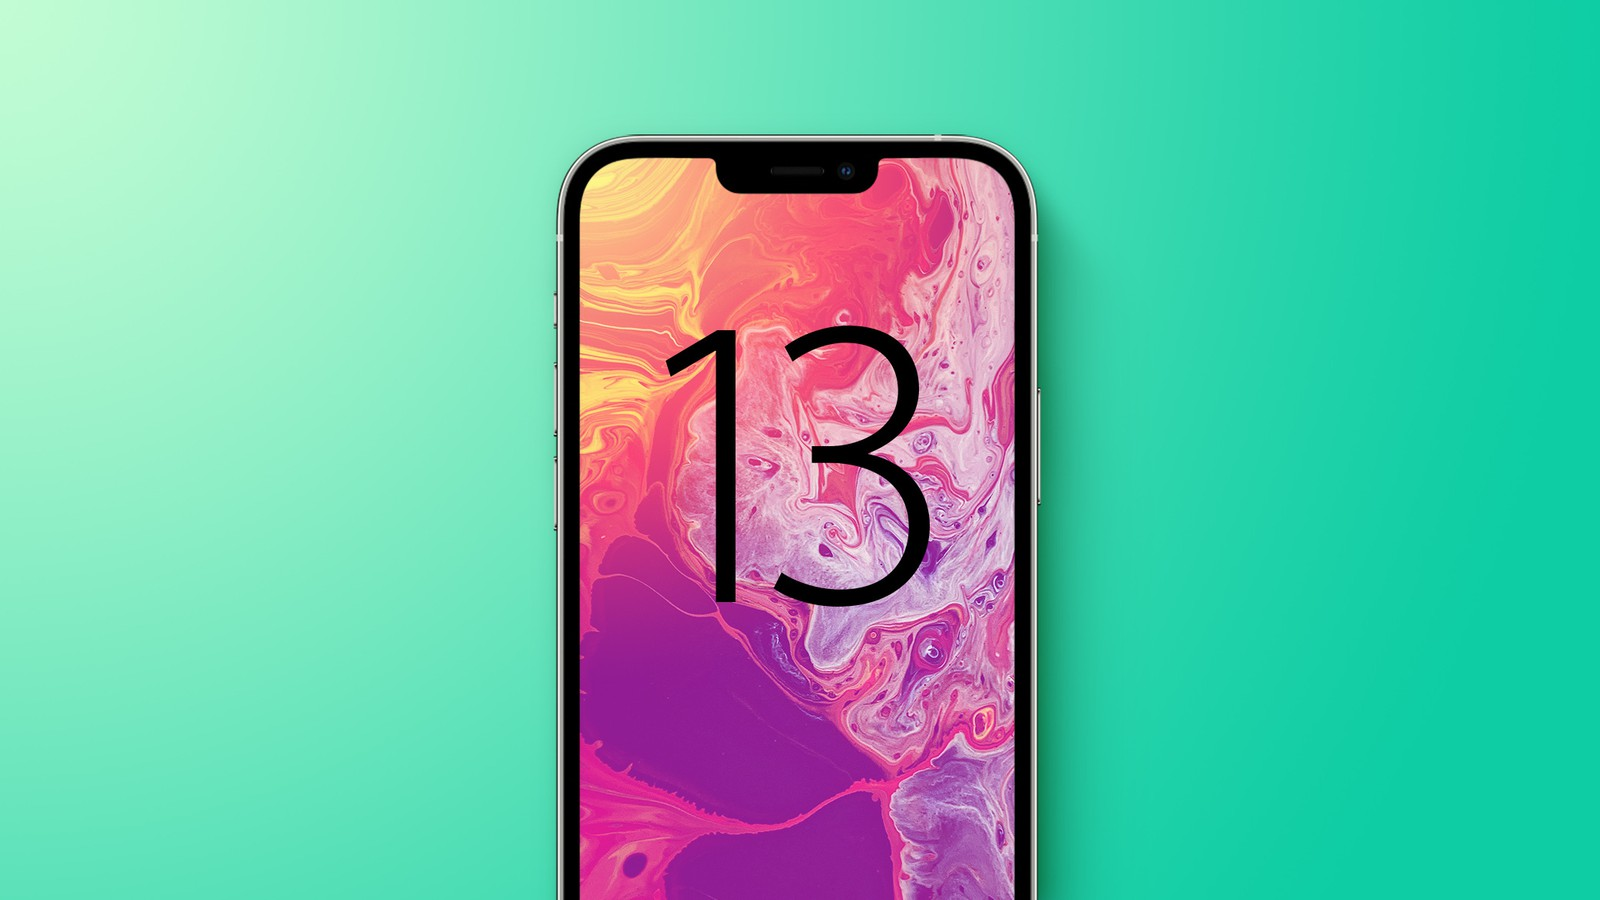 Rykte: iPhone 13 Pro kommer med 1 TB minne